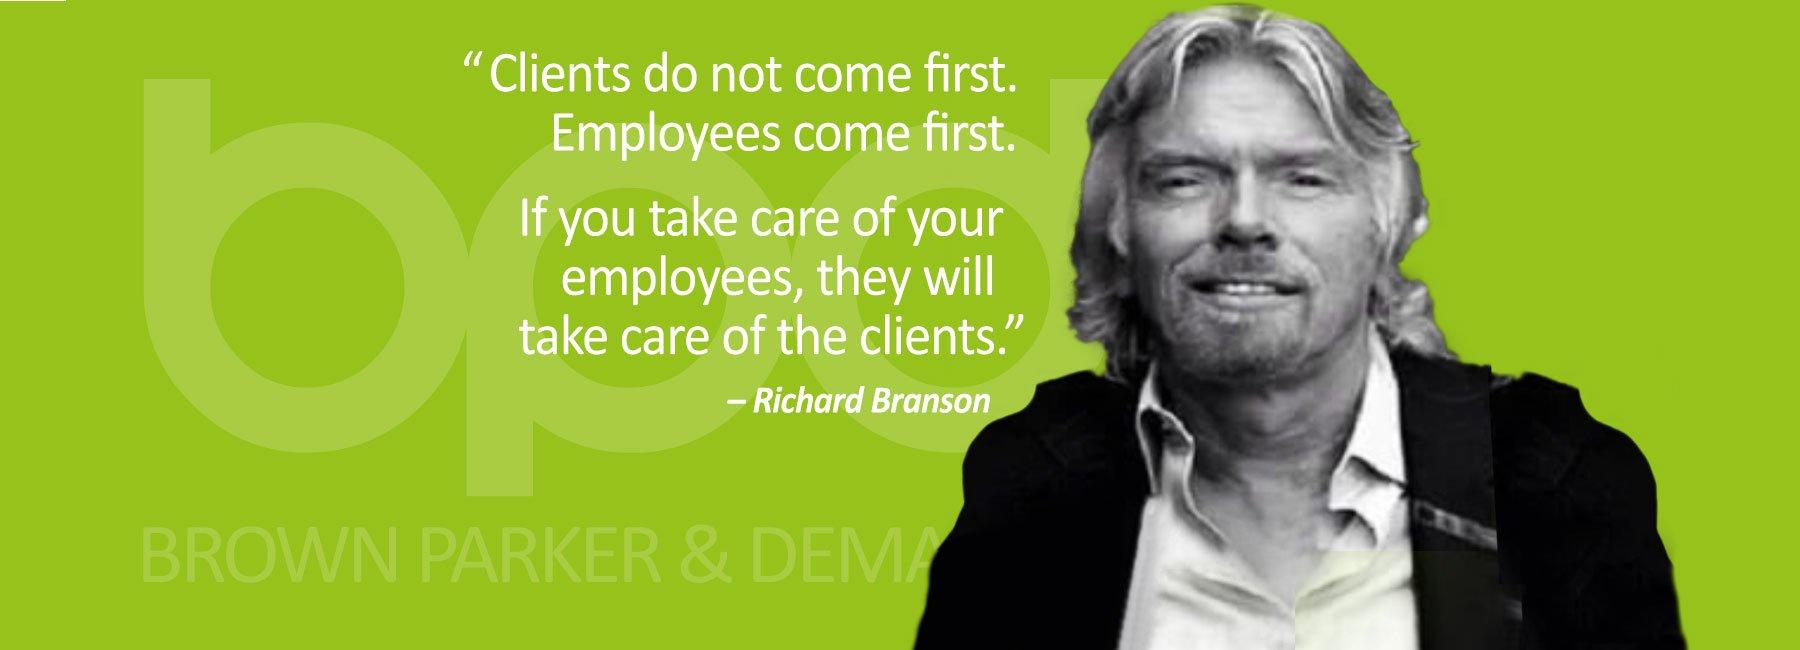 Put Employees First | BPD Advertising